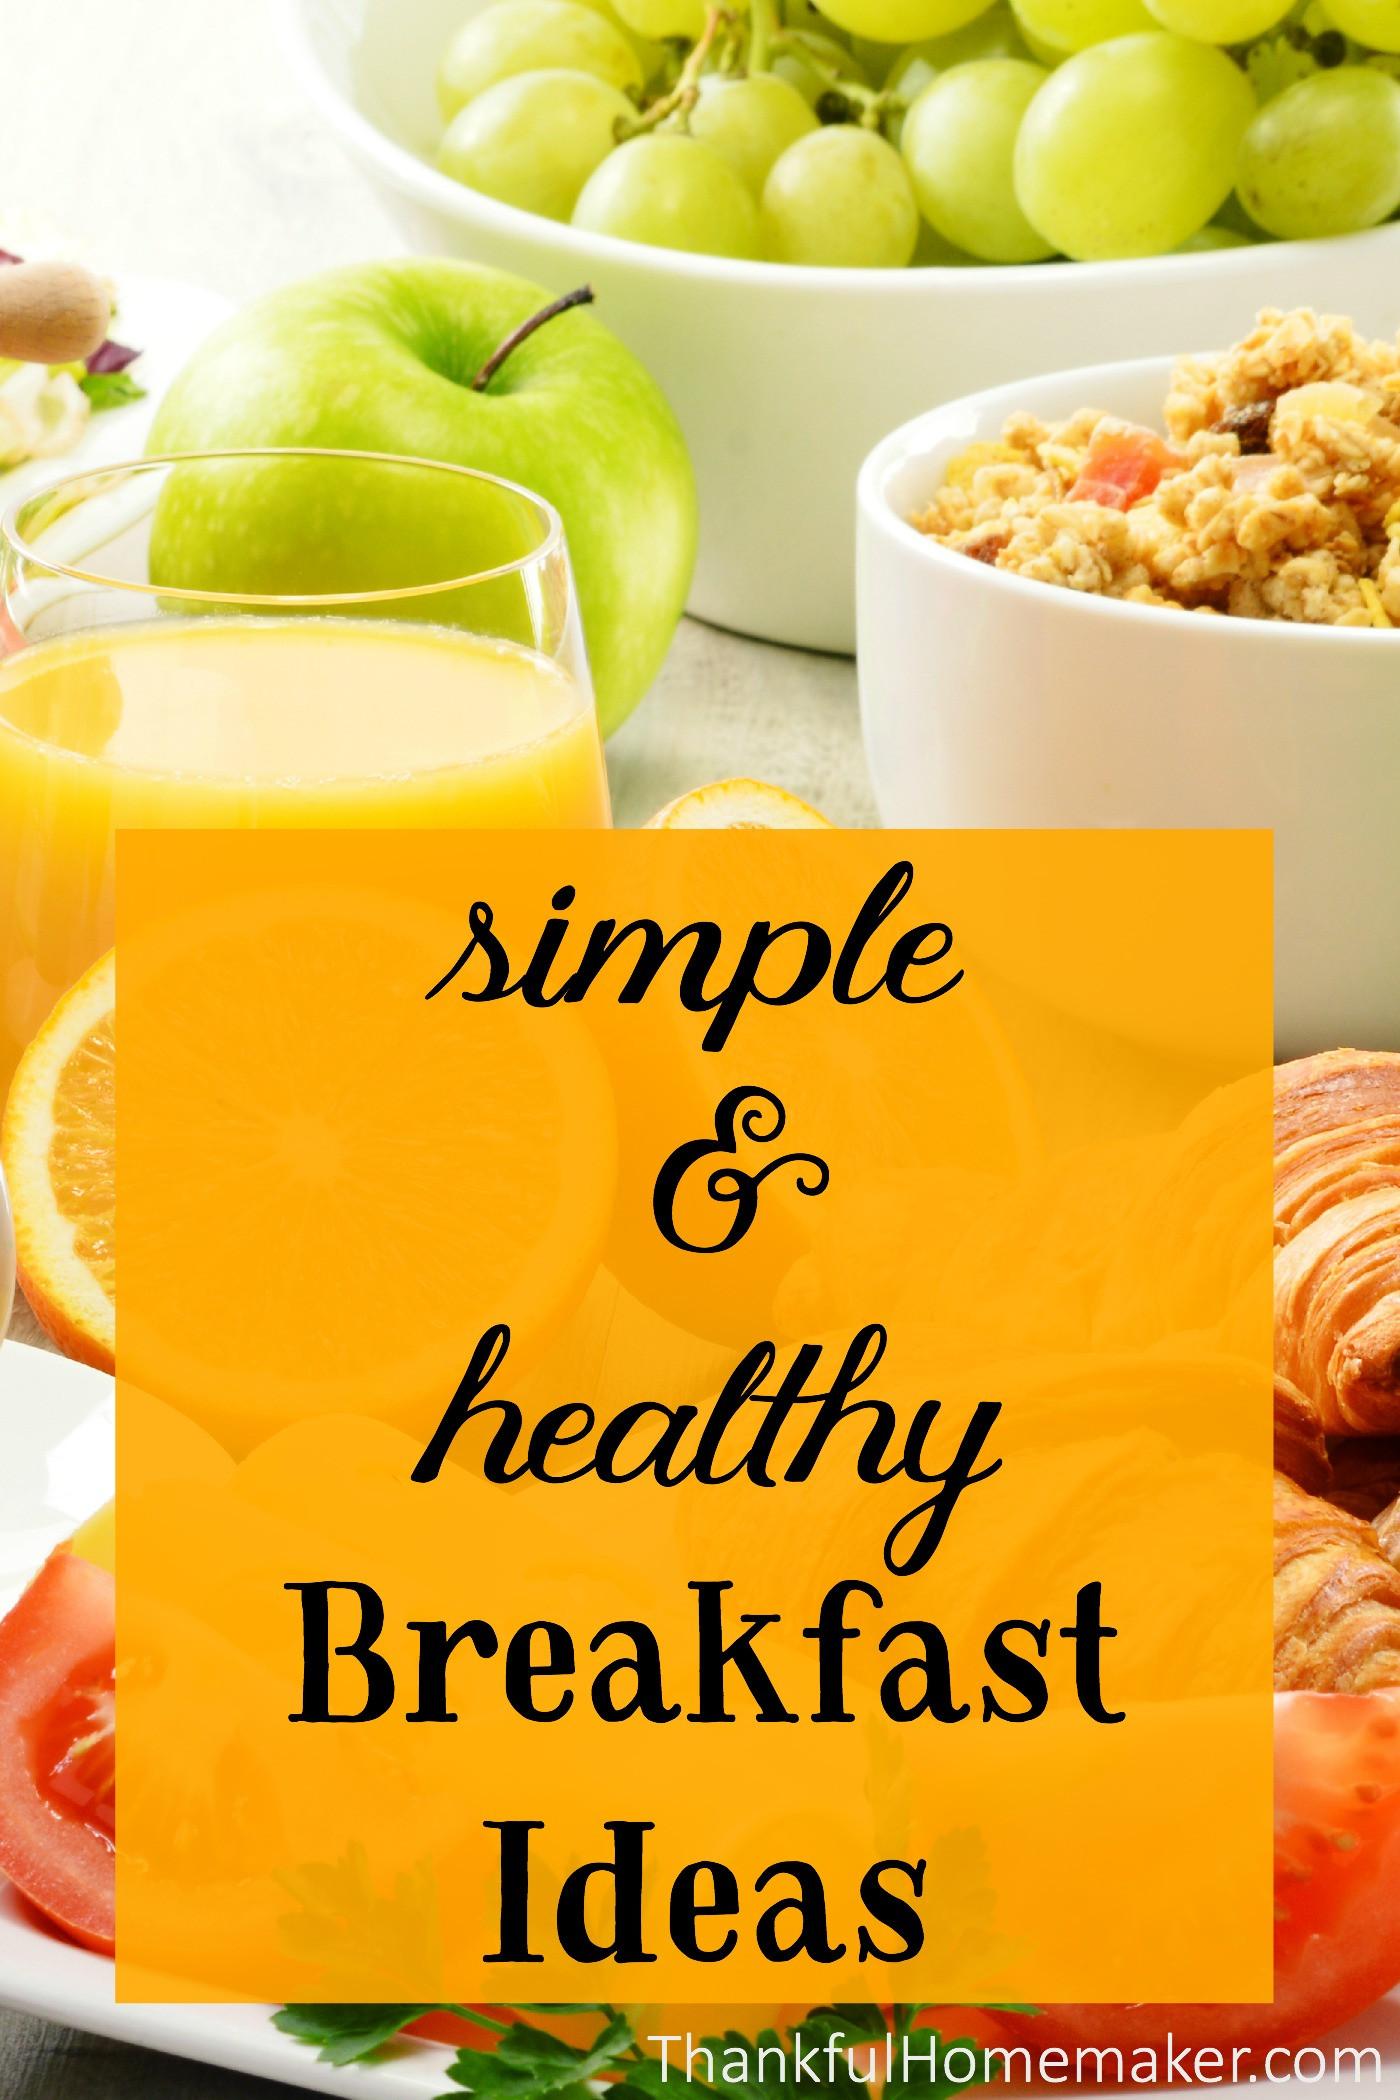 Simple Healthy Breakfast Recipes  Simple & Healthy Breakfast Ideas Thankful Homemaker